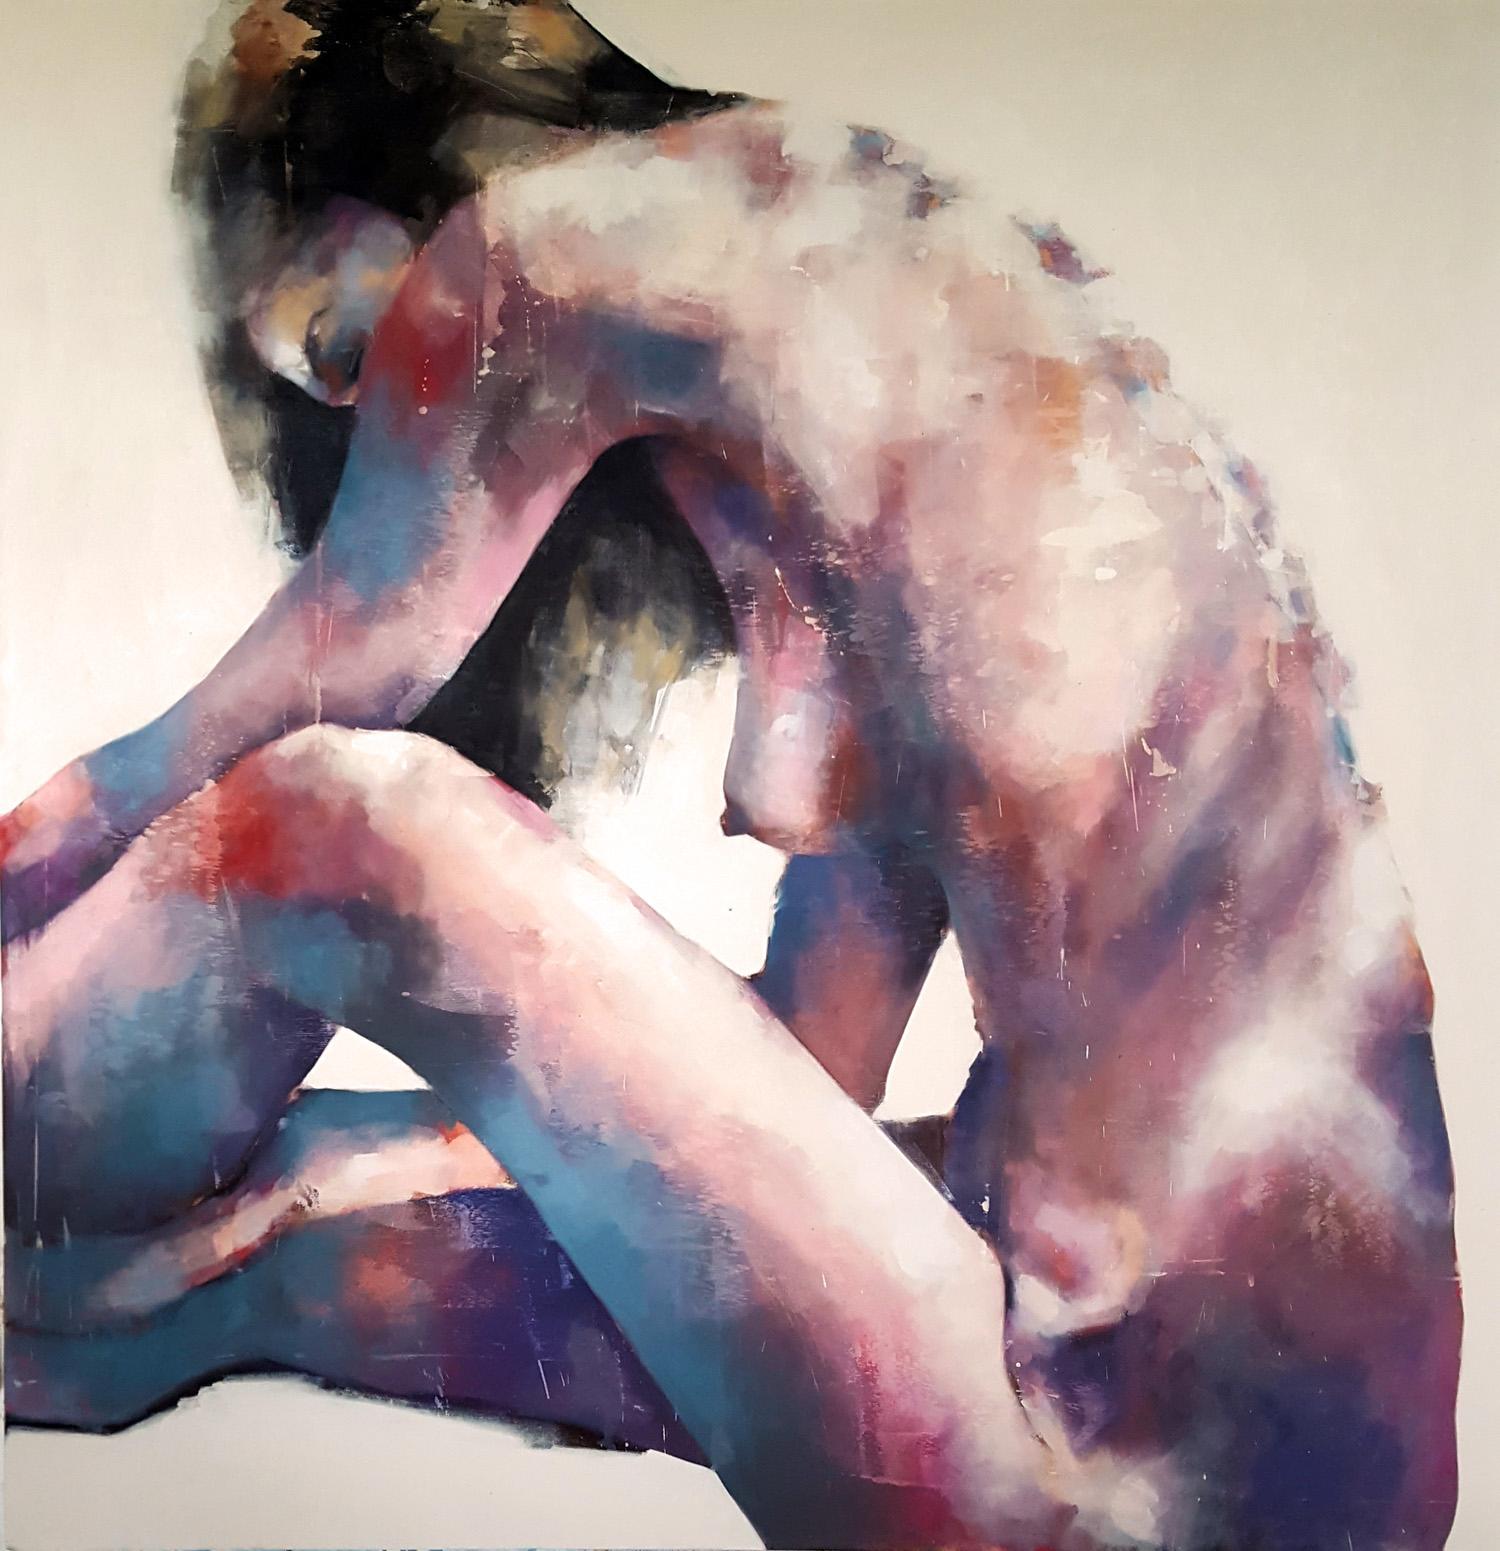 8-17-17-figure-oil-on-canvas-150x150cm